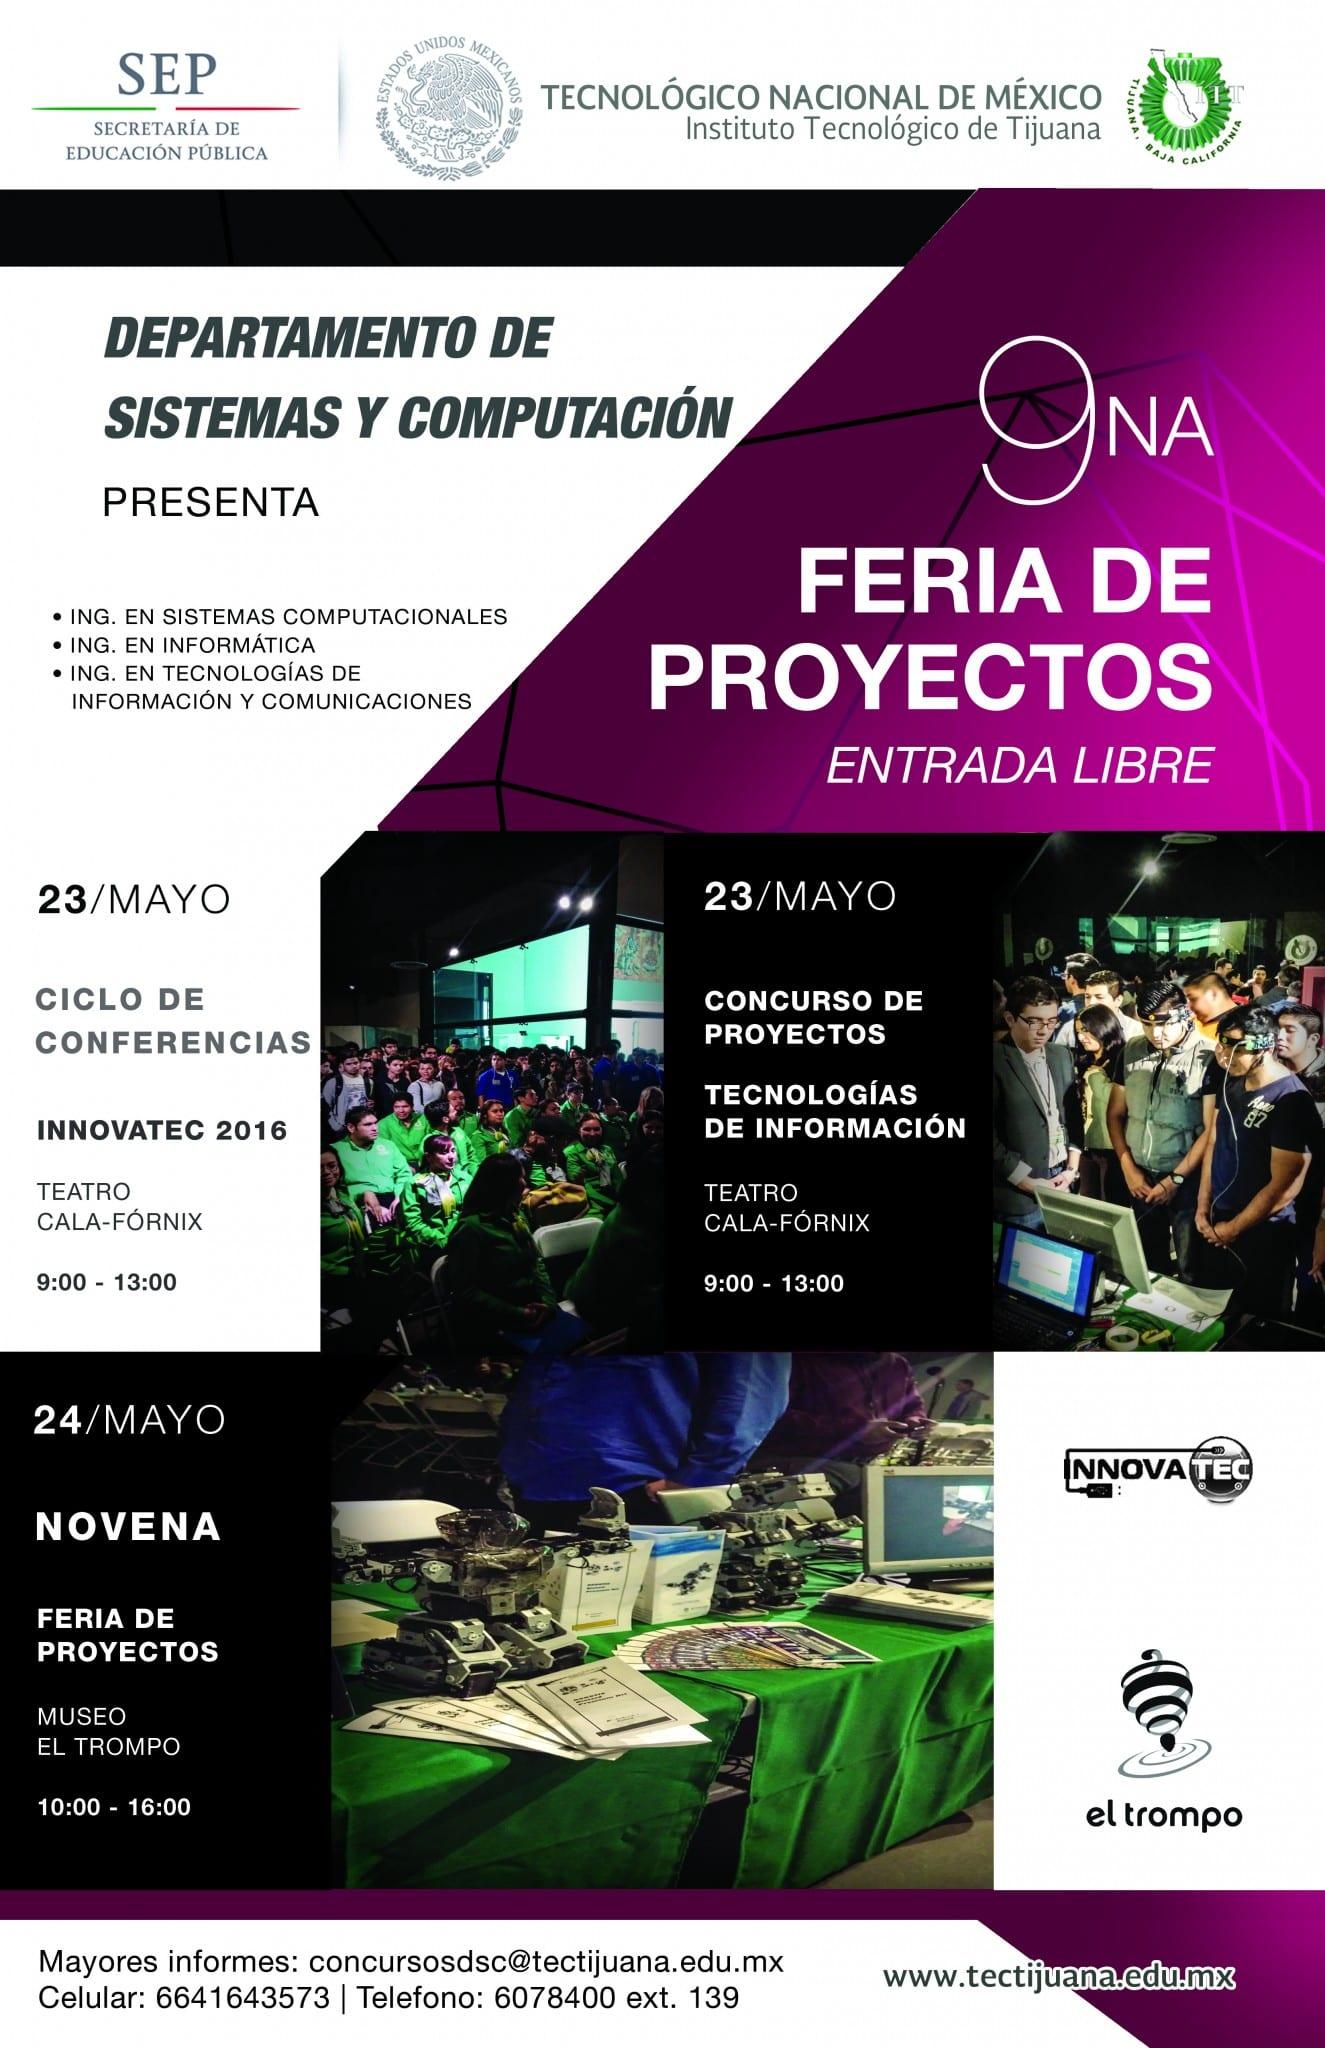 9na FERIA DE PROYECTOS